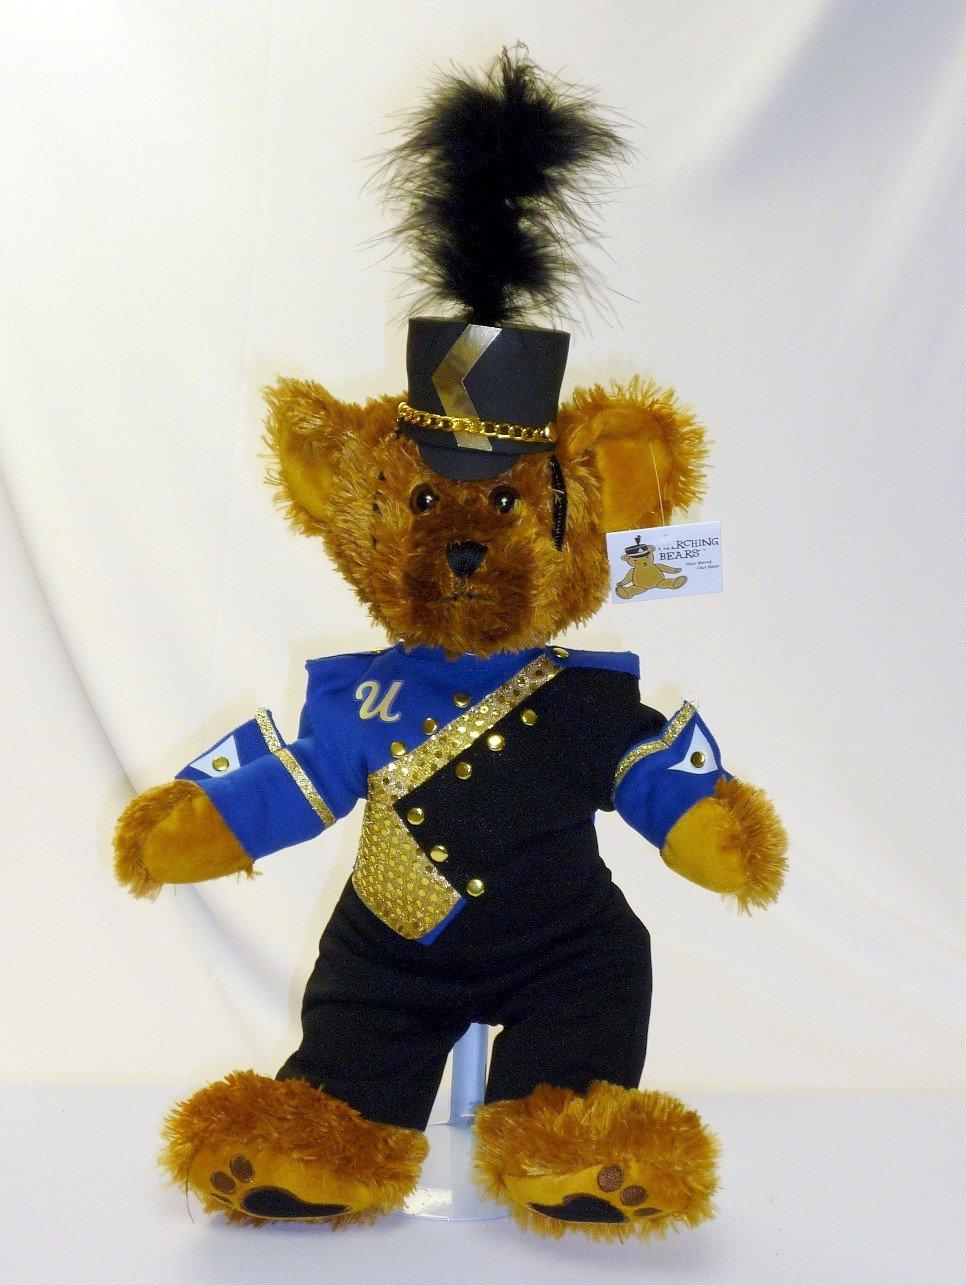 Unionville HS Marching Band Uniform Teddy Bear